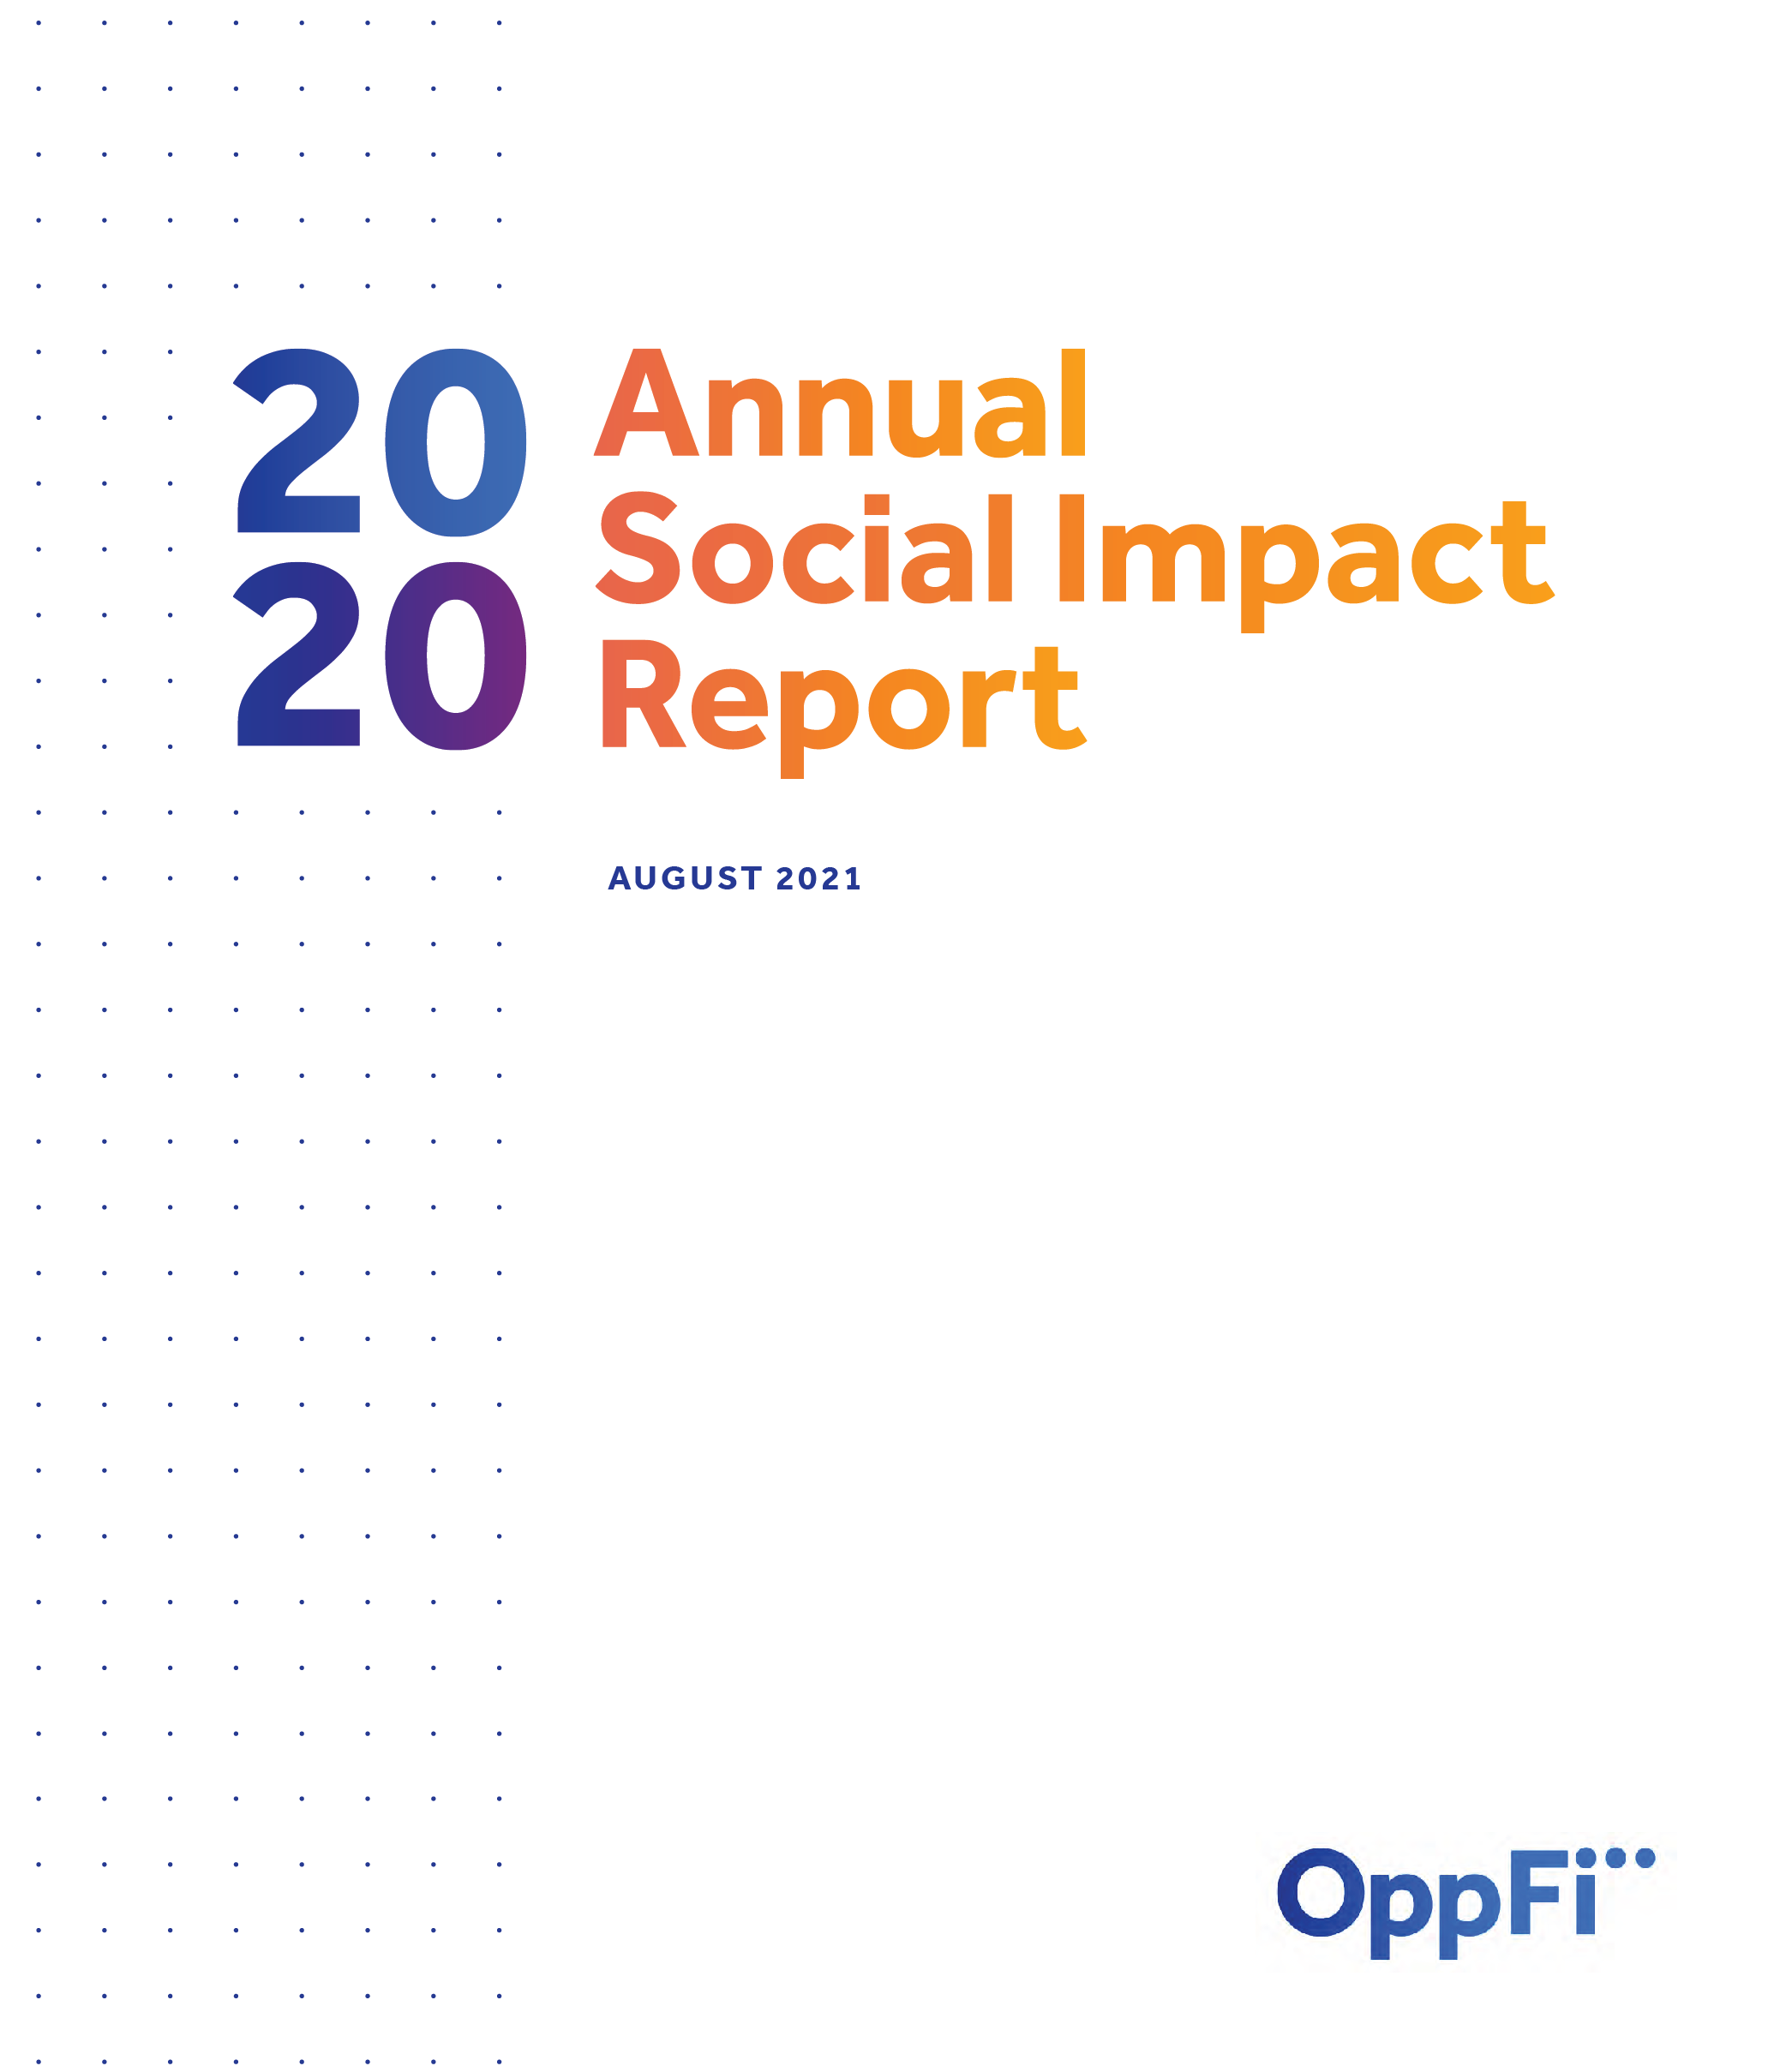 2020 Annual Social Impact Report